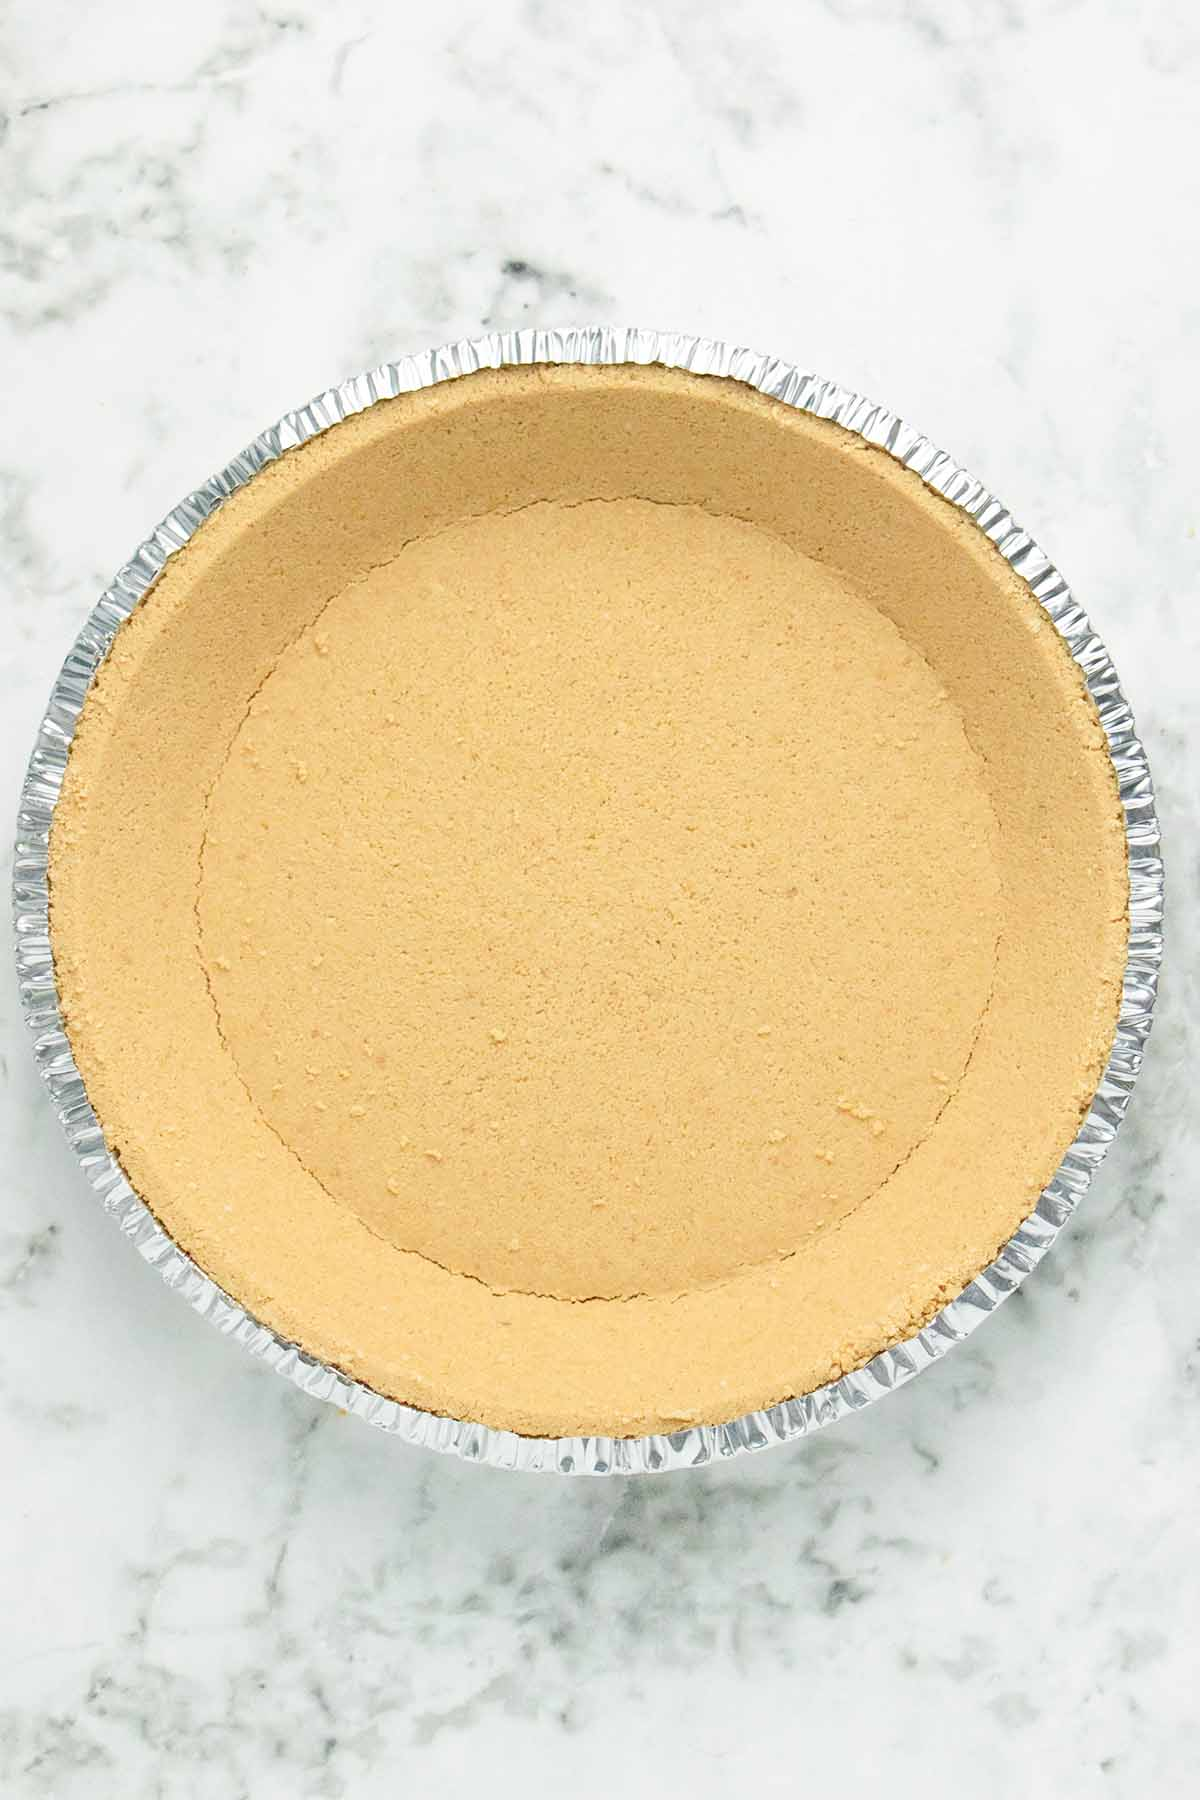 vegan graham cracker crust on a marble table